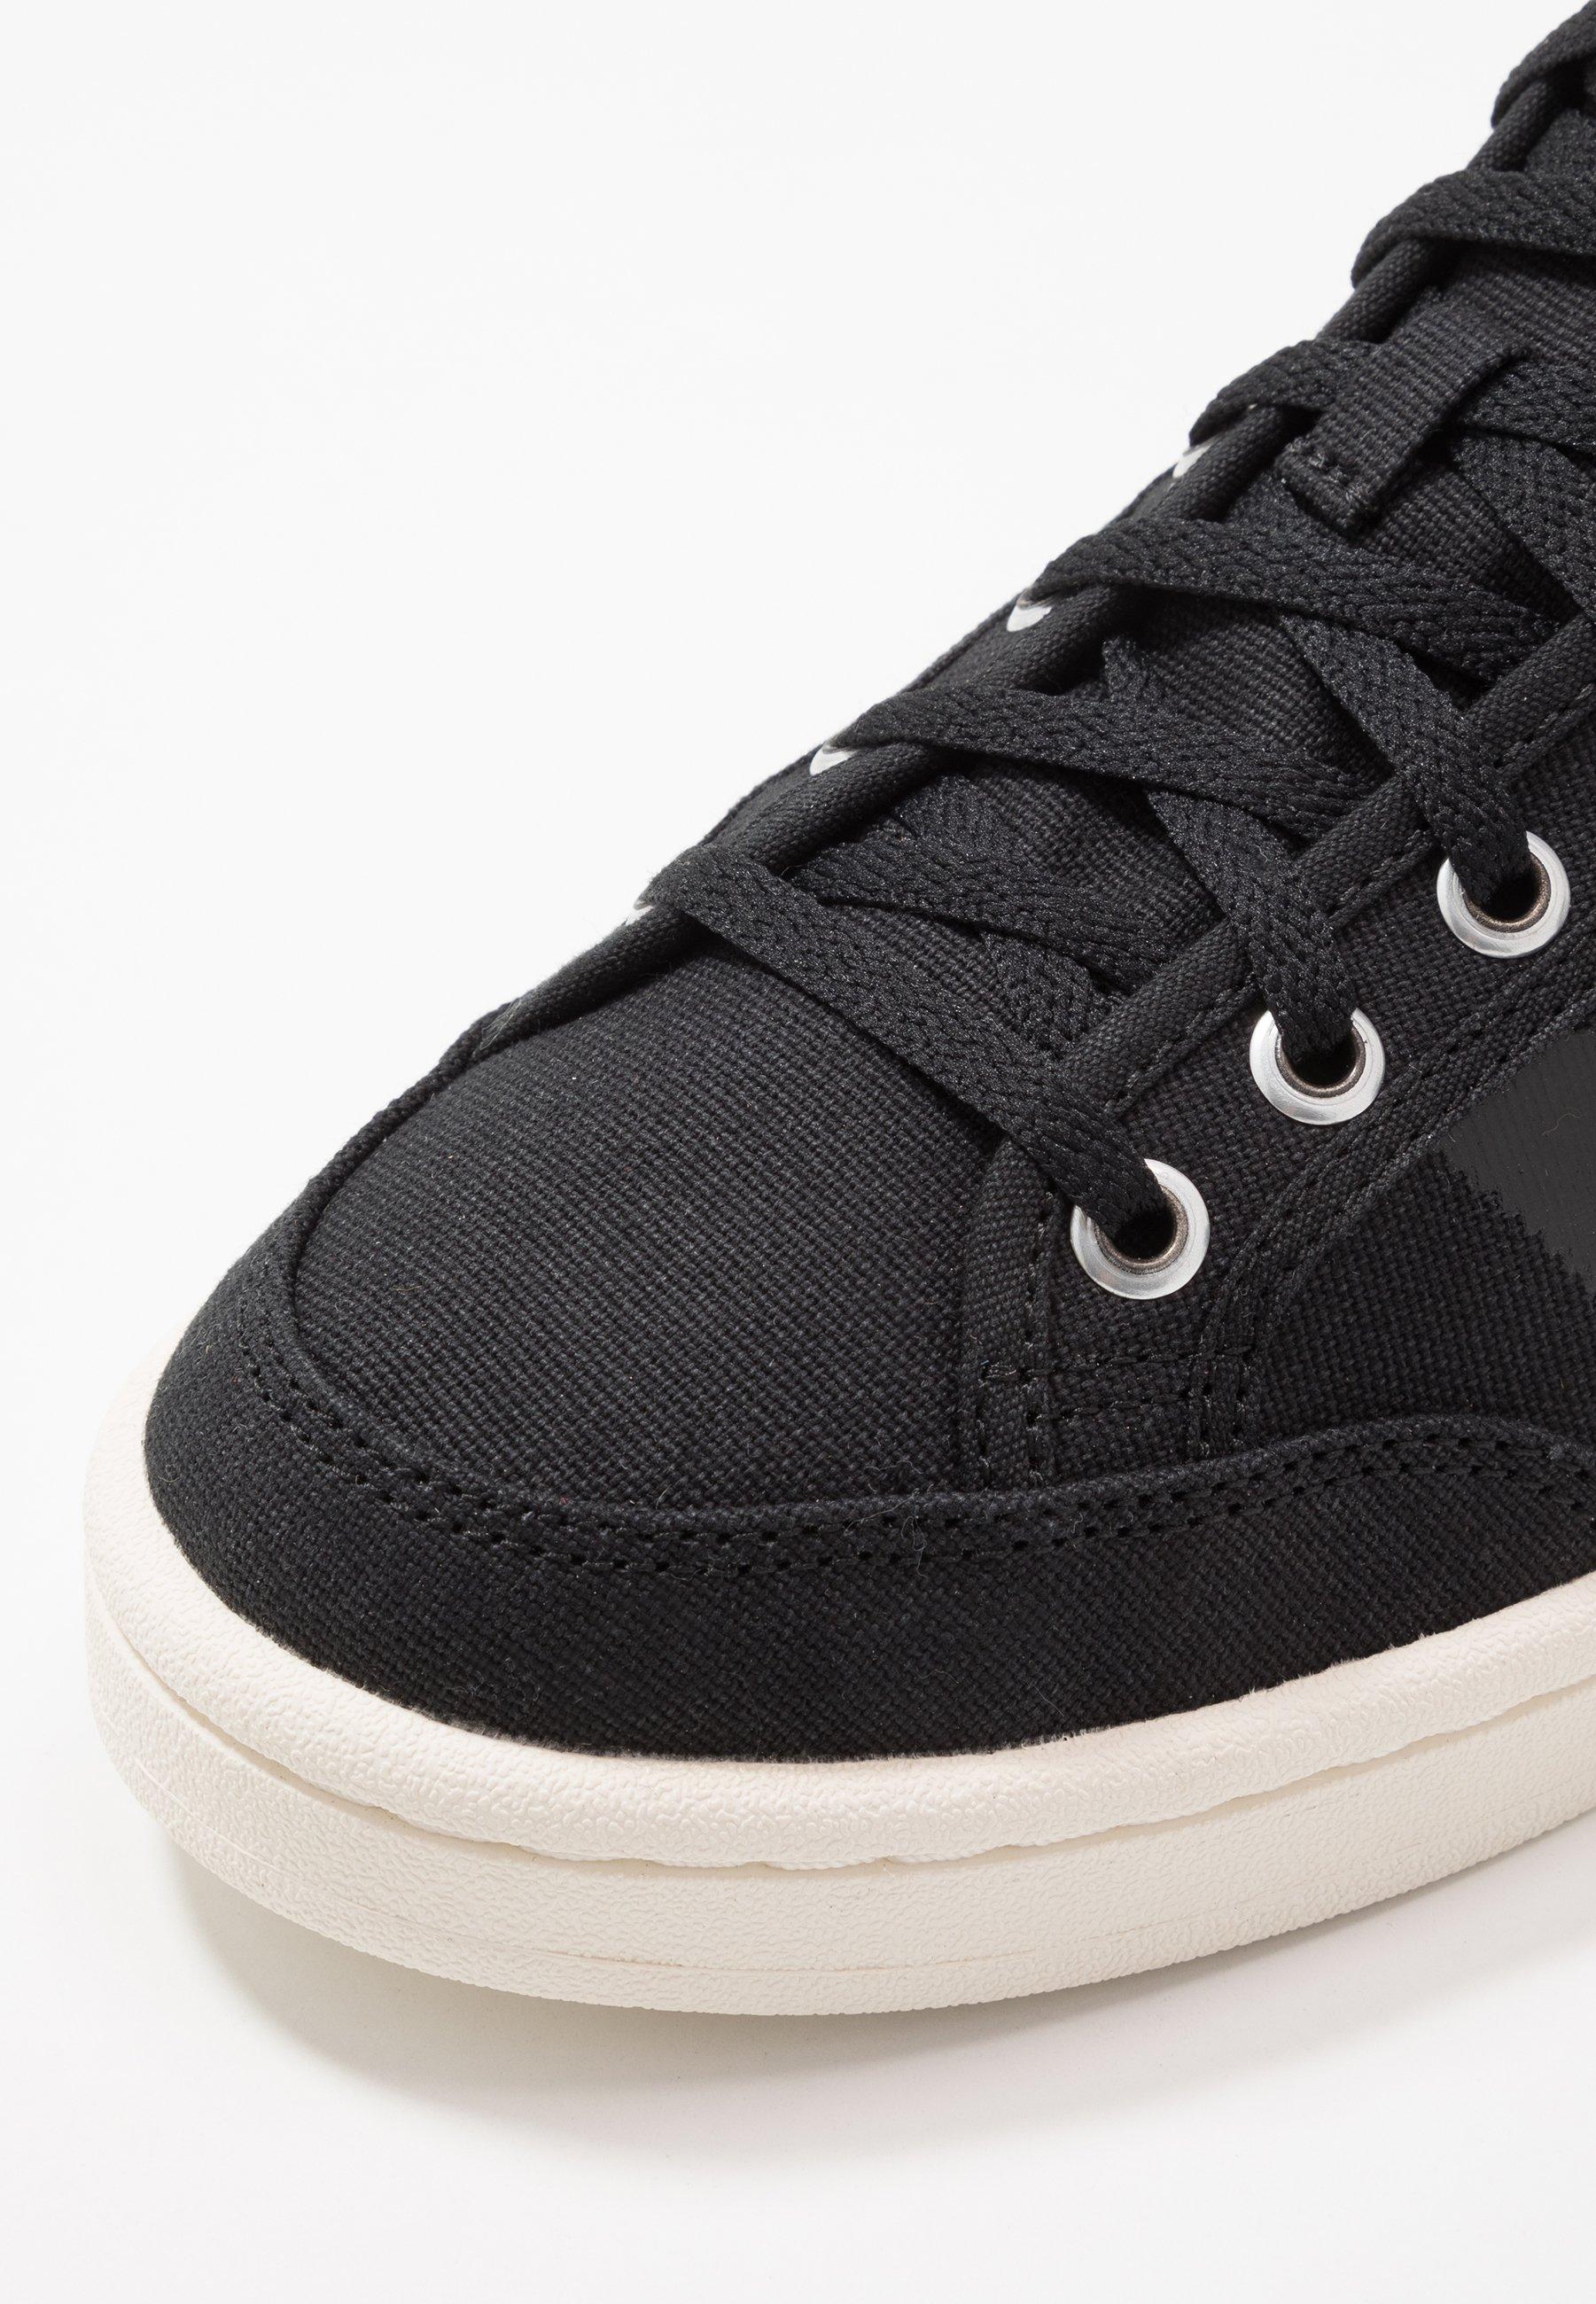 Adidas Originals Americana Decon - Baskets Montantes Core Black/core White yHdz5wl